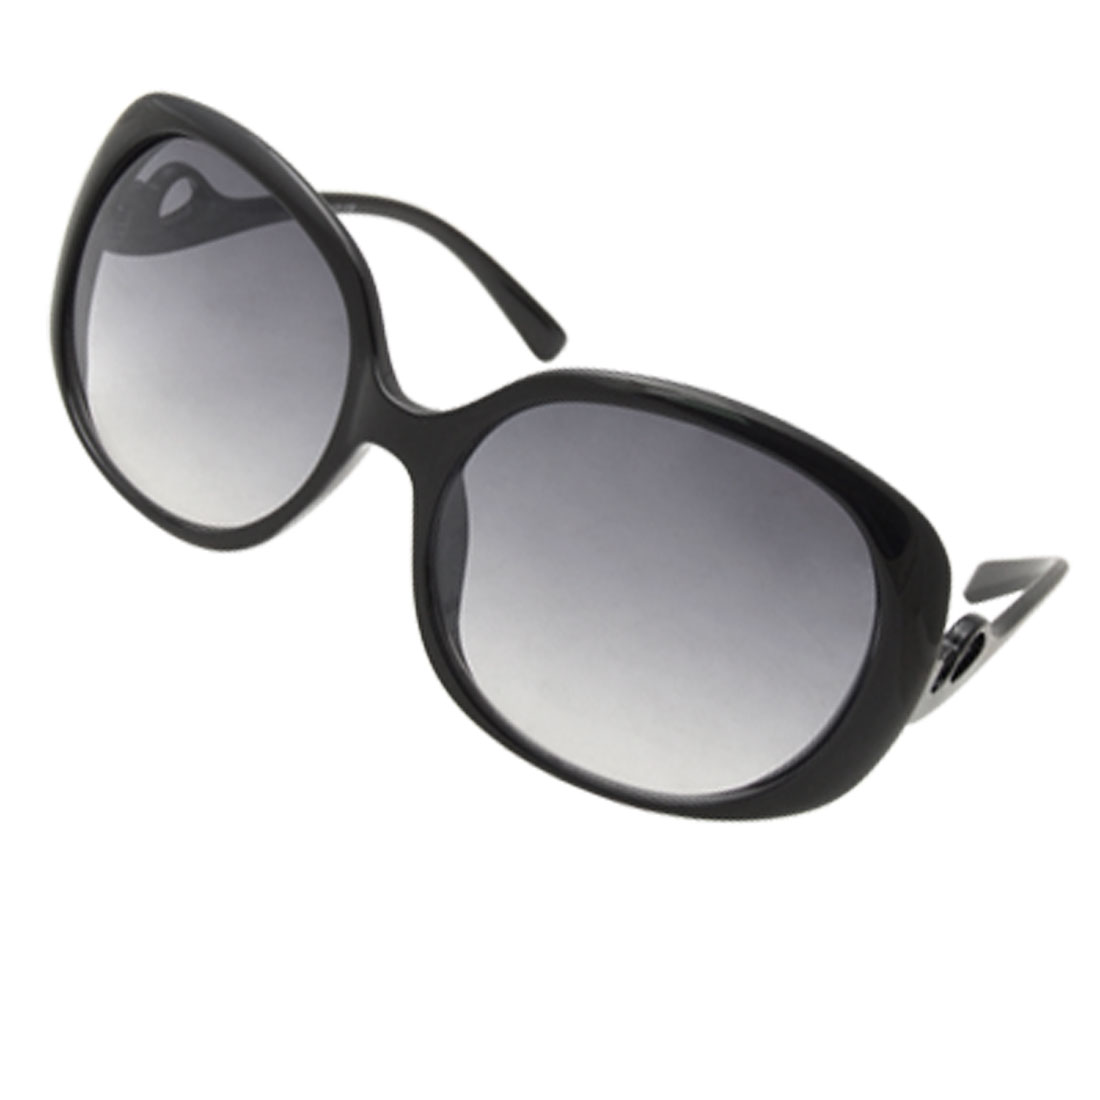 Fashion Black Frame Plastic Sunglasses Eyewear for Ladies